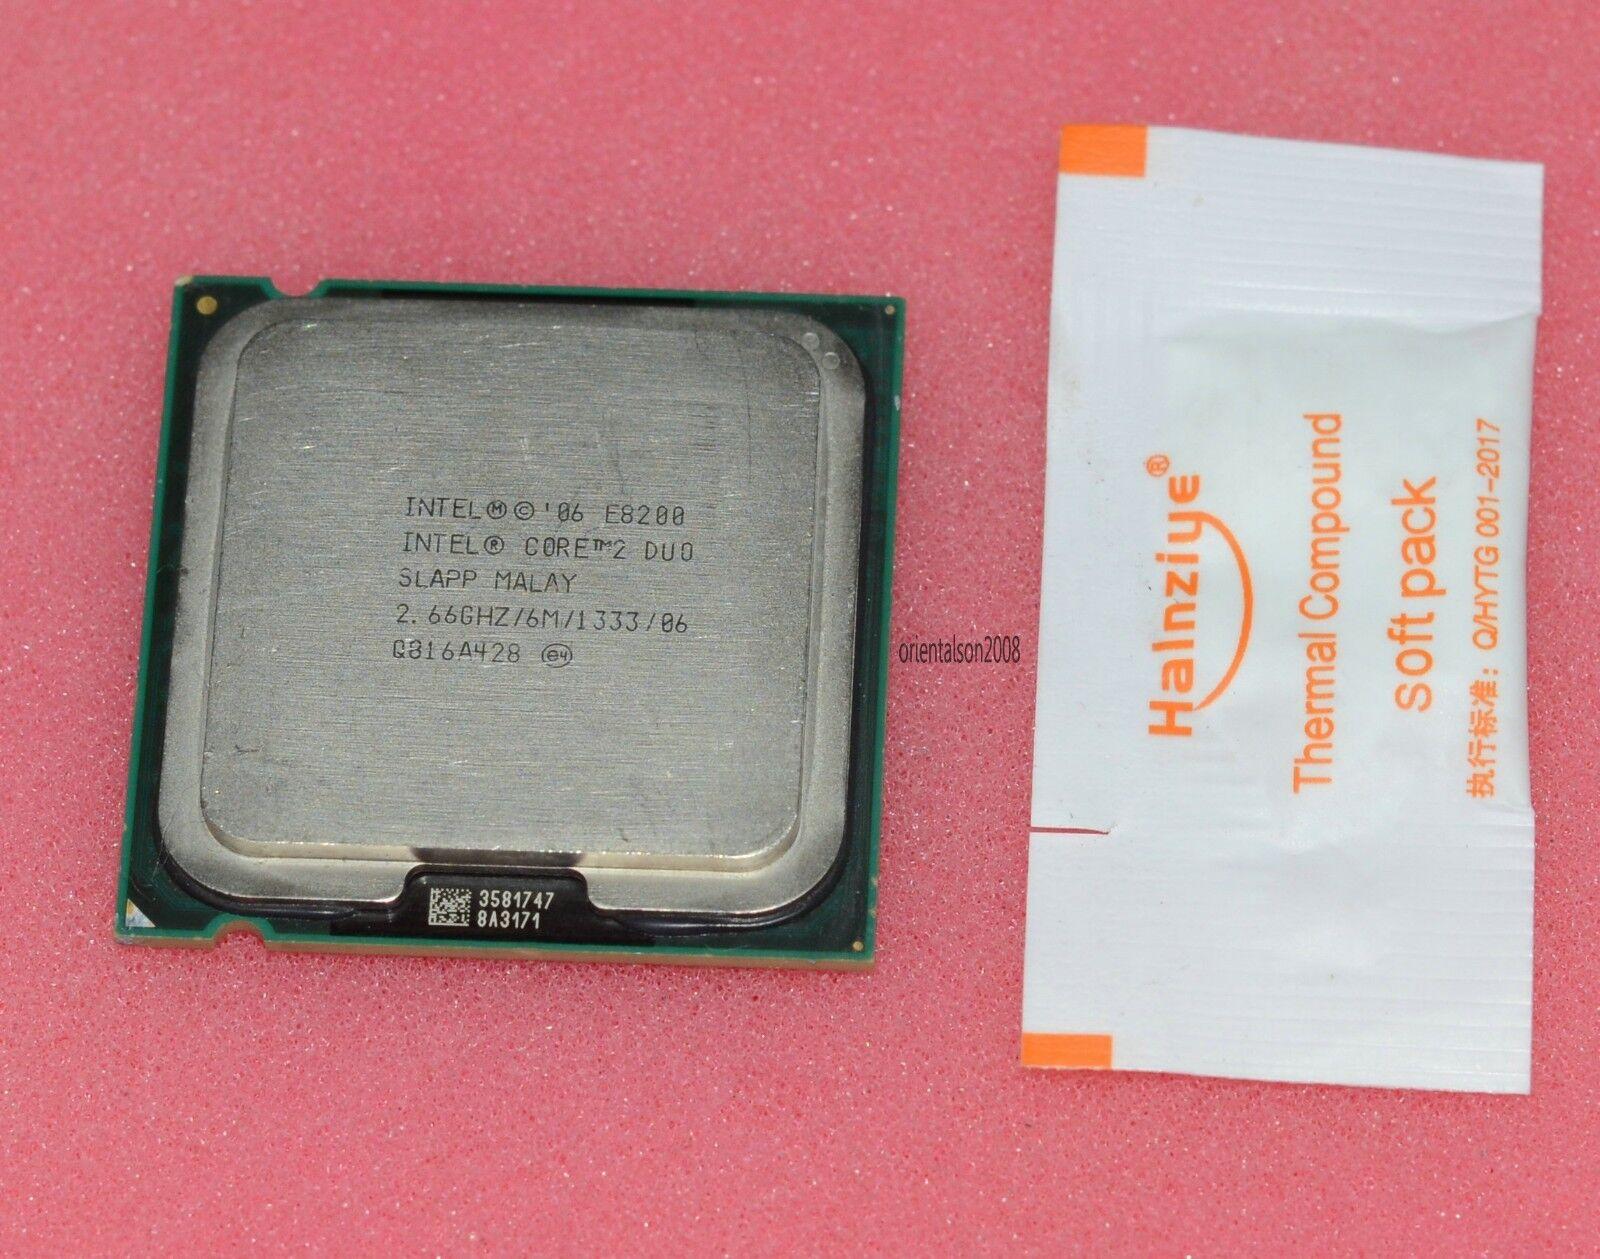 Admirable Intel Core 2 Duo E8200 2 66Ghz Dual Core Eu80570Pj0676M Processor Unemploymentrelief Wooden Chair Designs For Living Room Unemploymentrelieforg